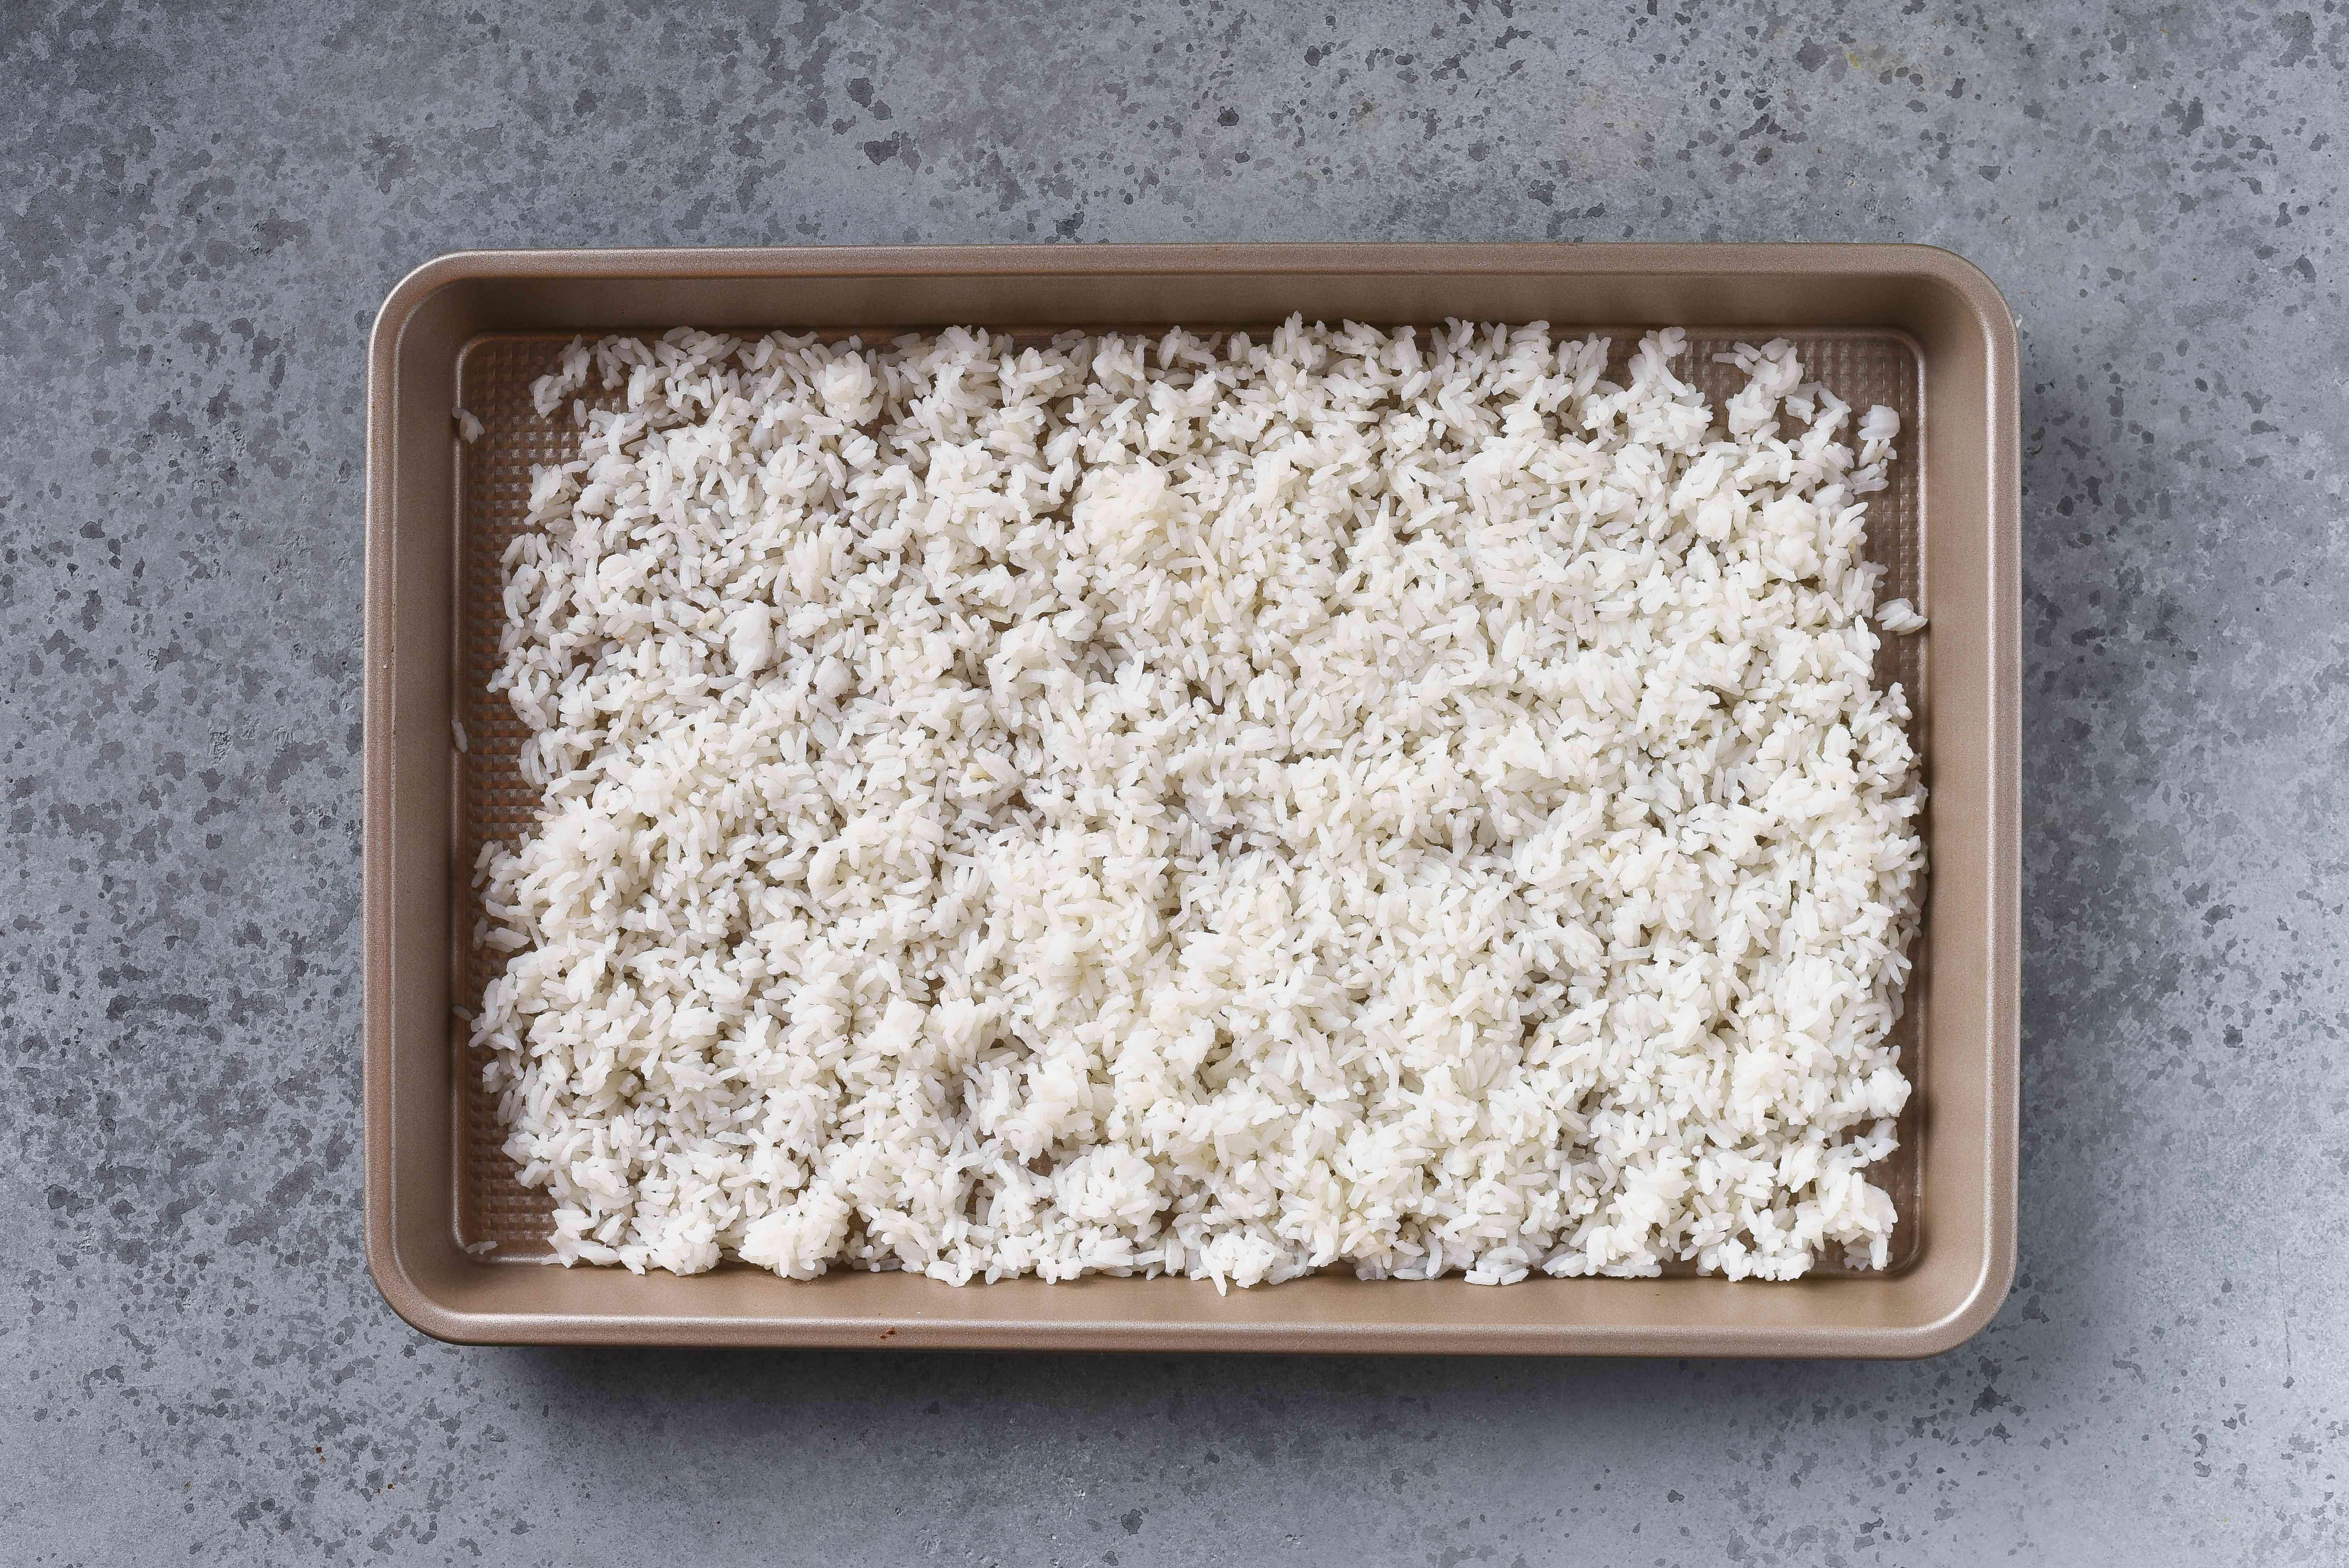 rice on a baking sheet